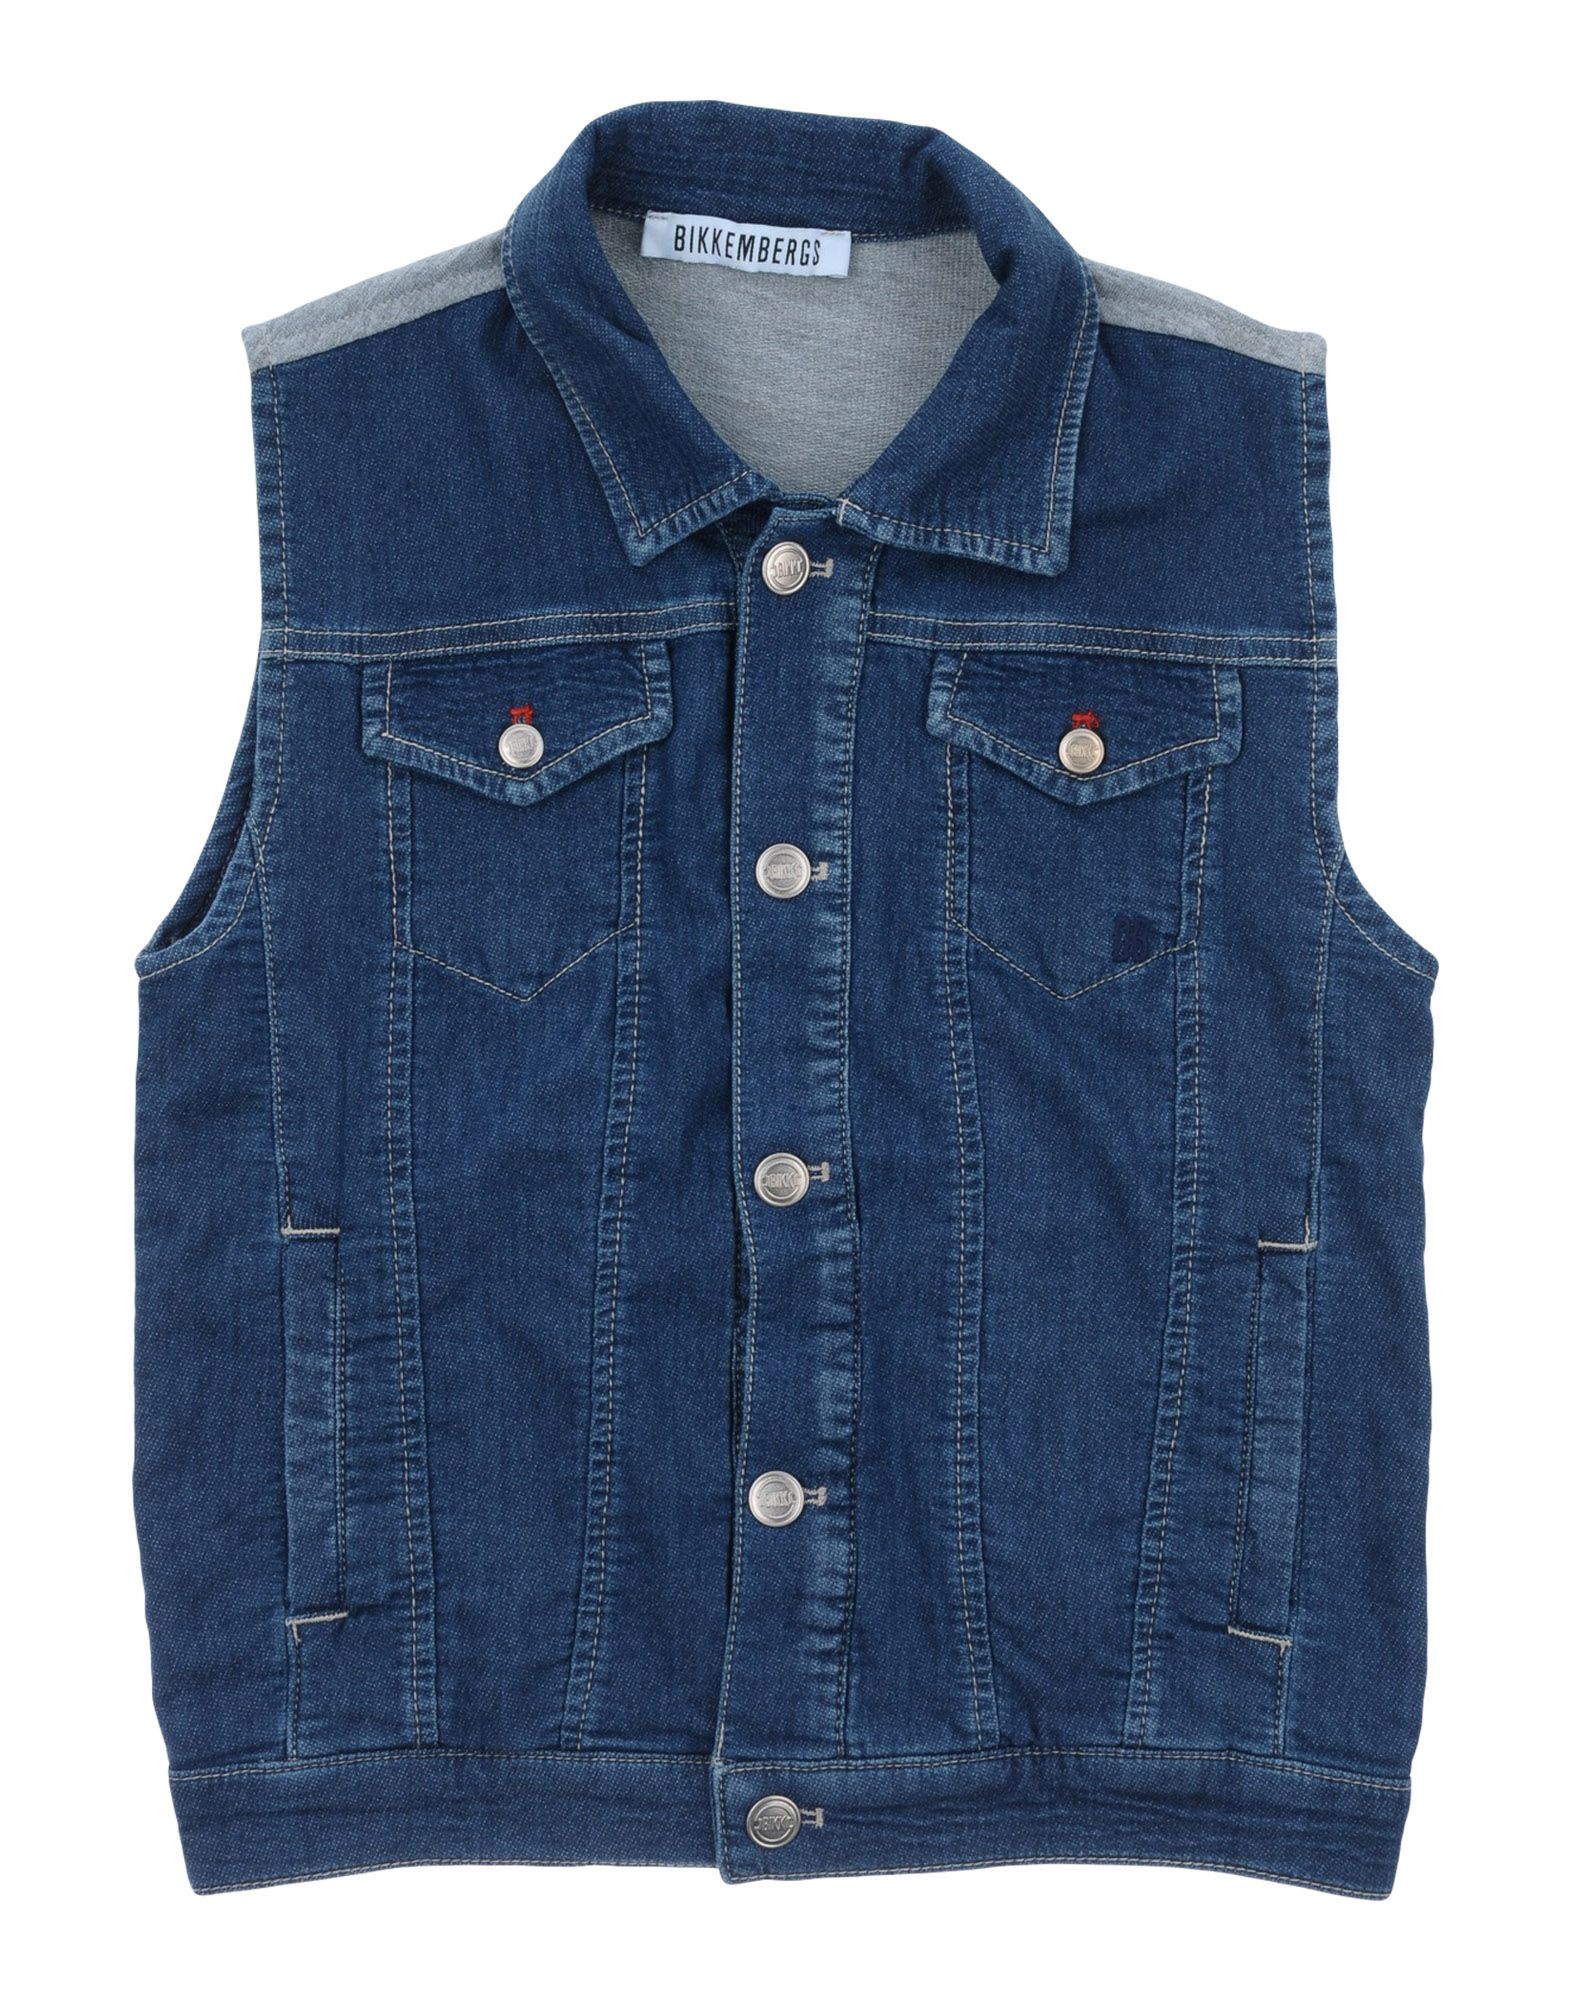 BIKKEMBERGS Джинсовая верхняя одежда джинсы bikkembergs c q 61b fj s b093 033b